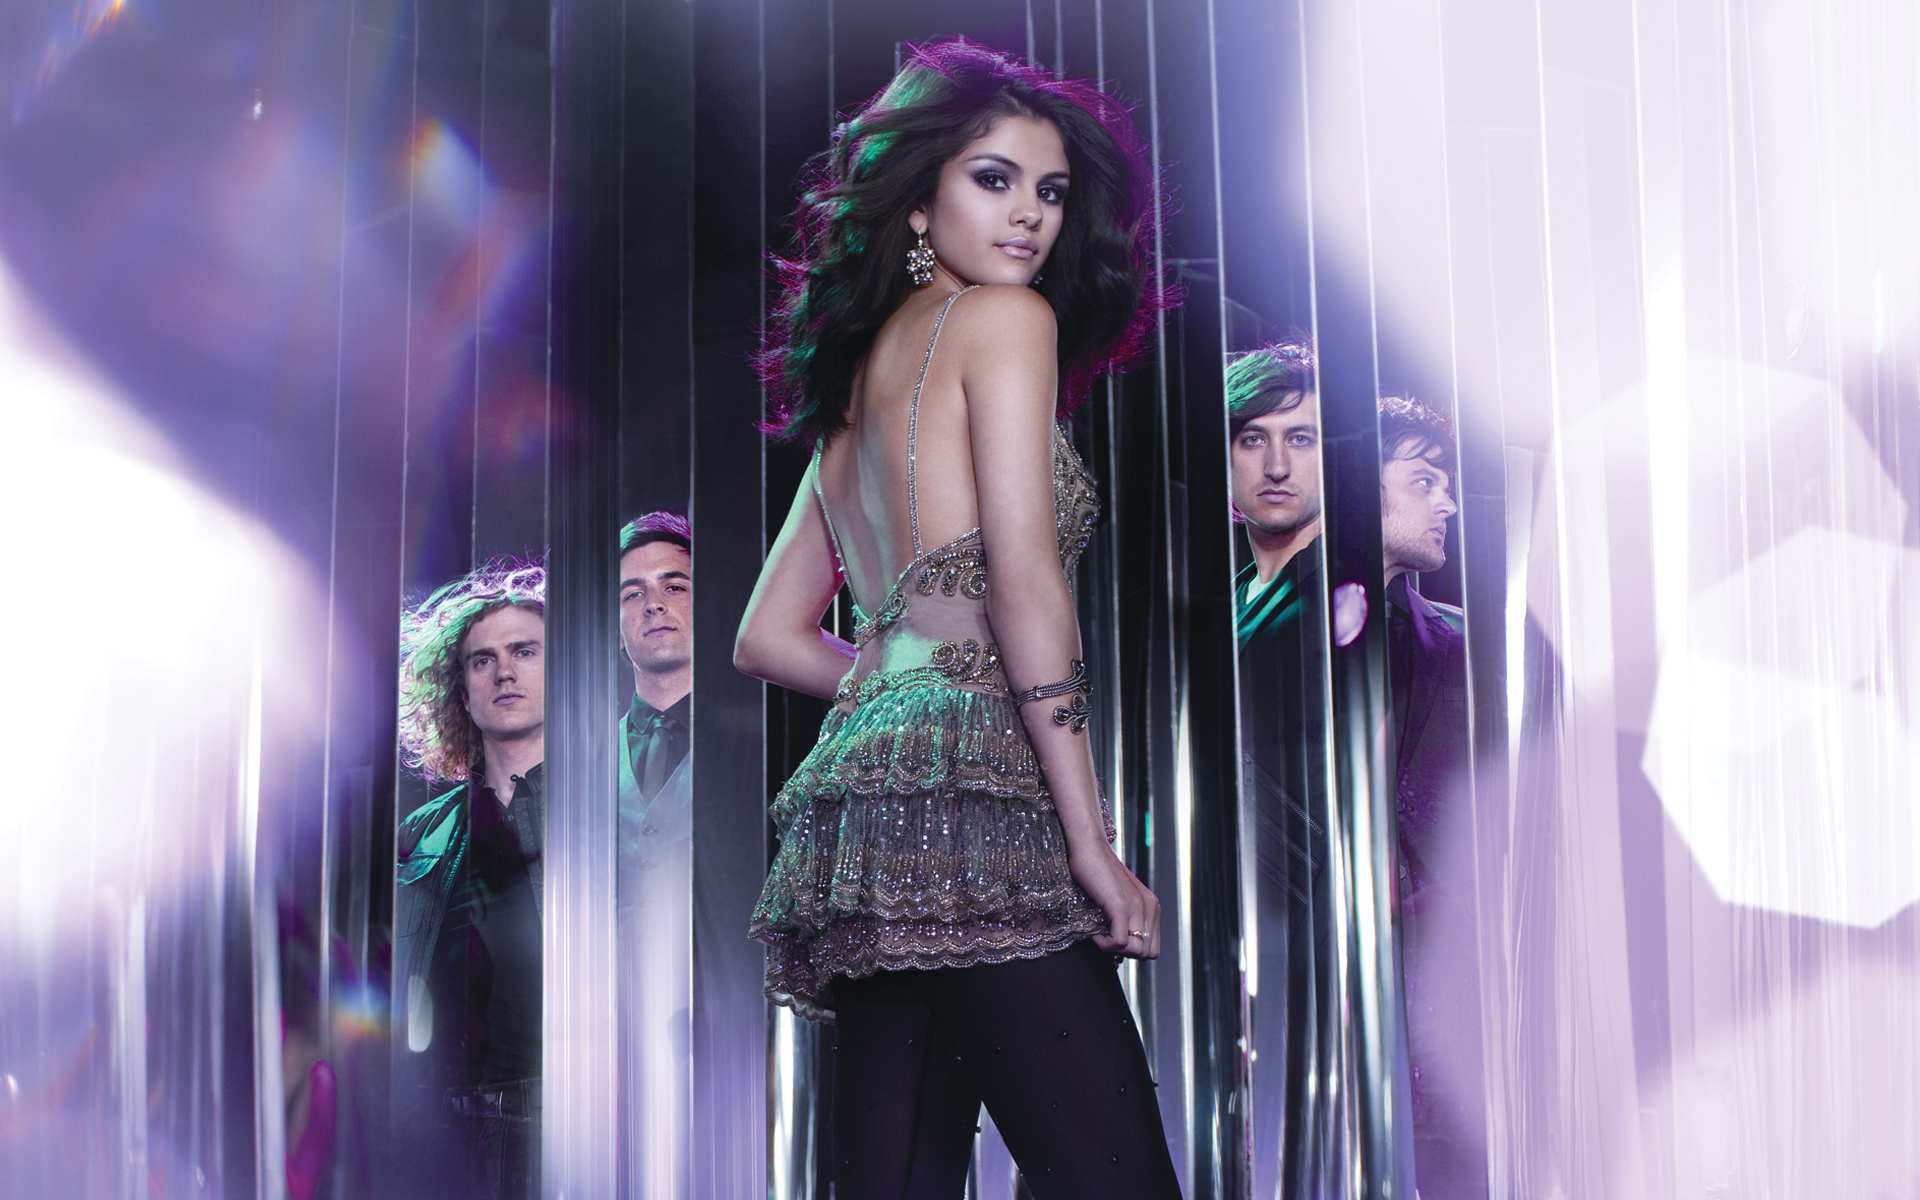 Selena Gomez 98 wallpaper